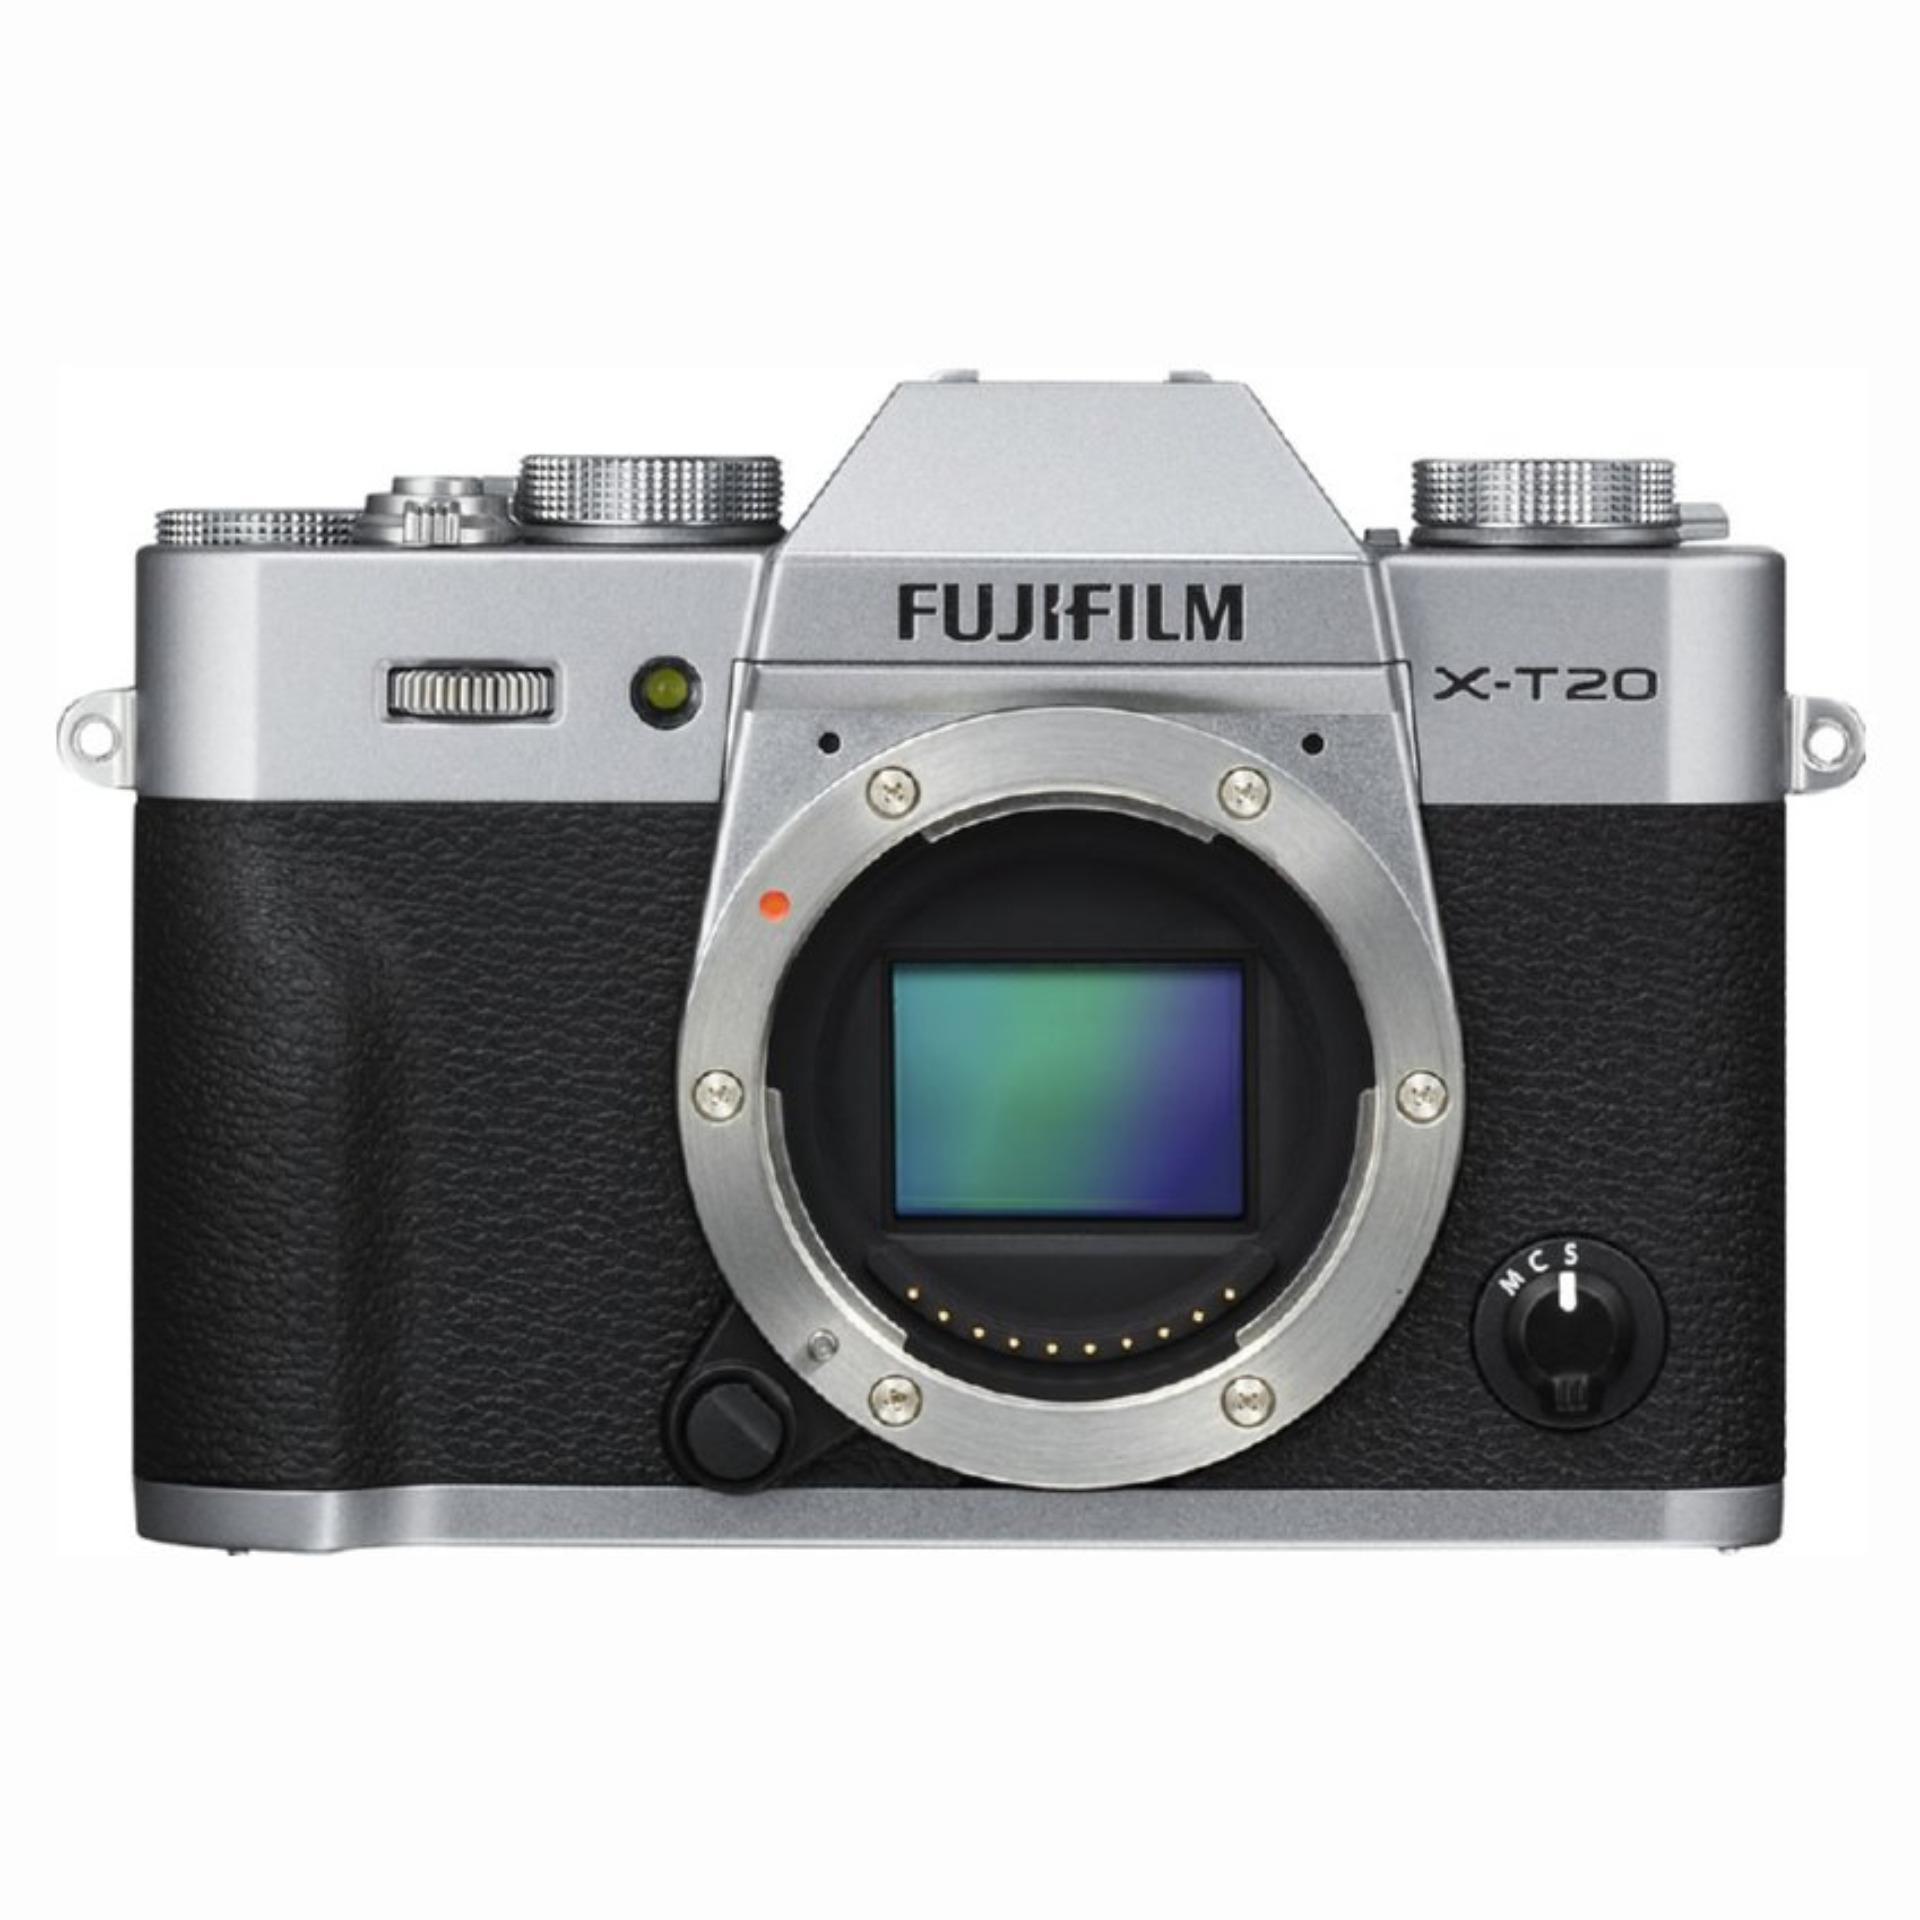 Fujifilm X-T20 Mirrorless Digital Camera Body Only (Silver)